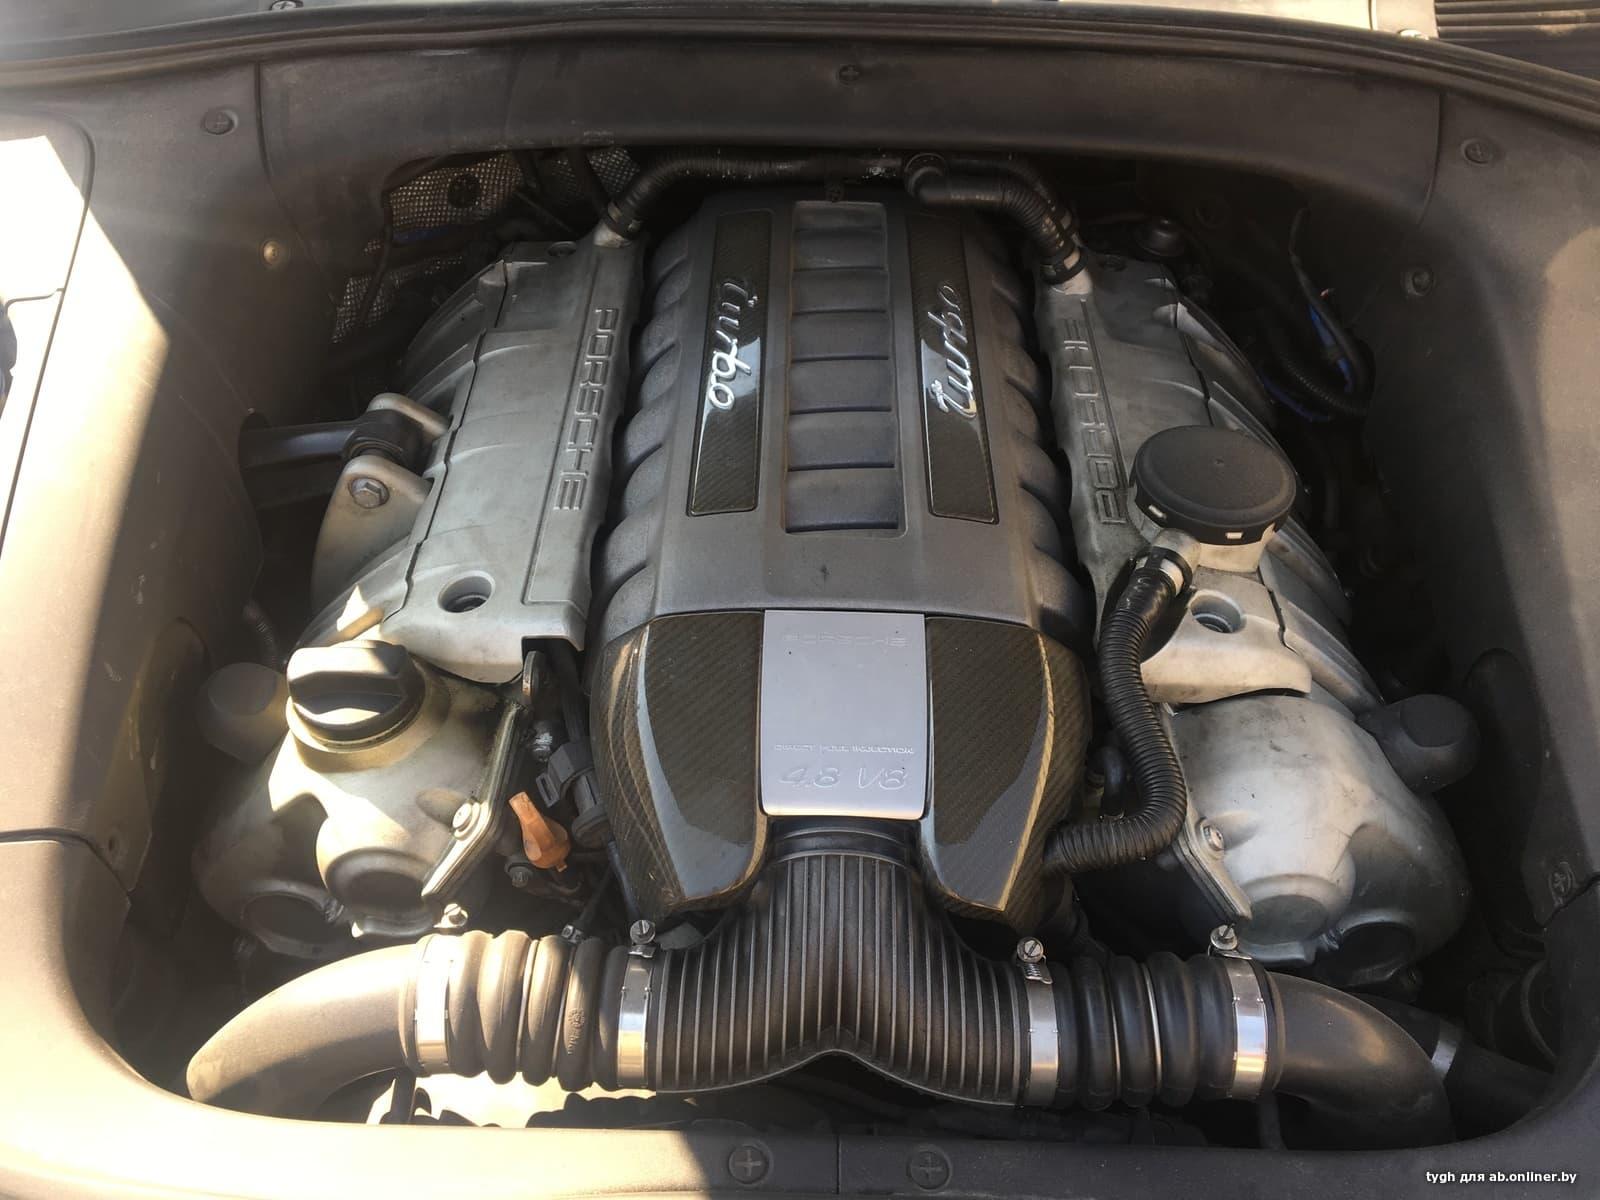 Porsche Cayenne I (957) Turbo S